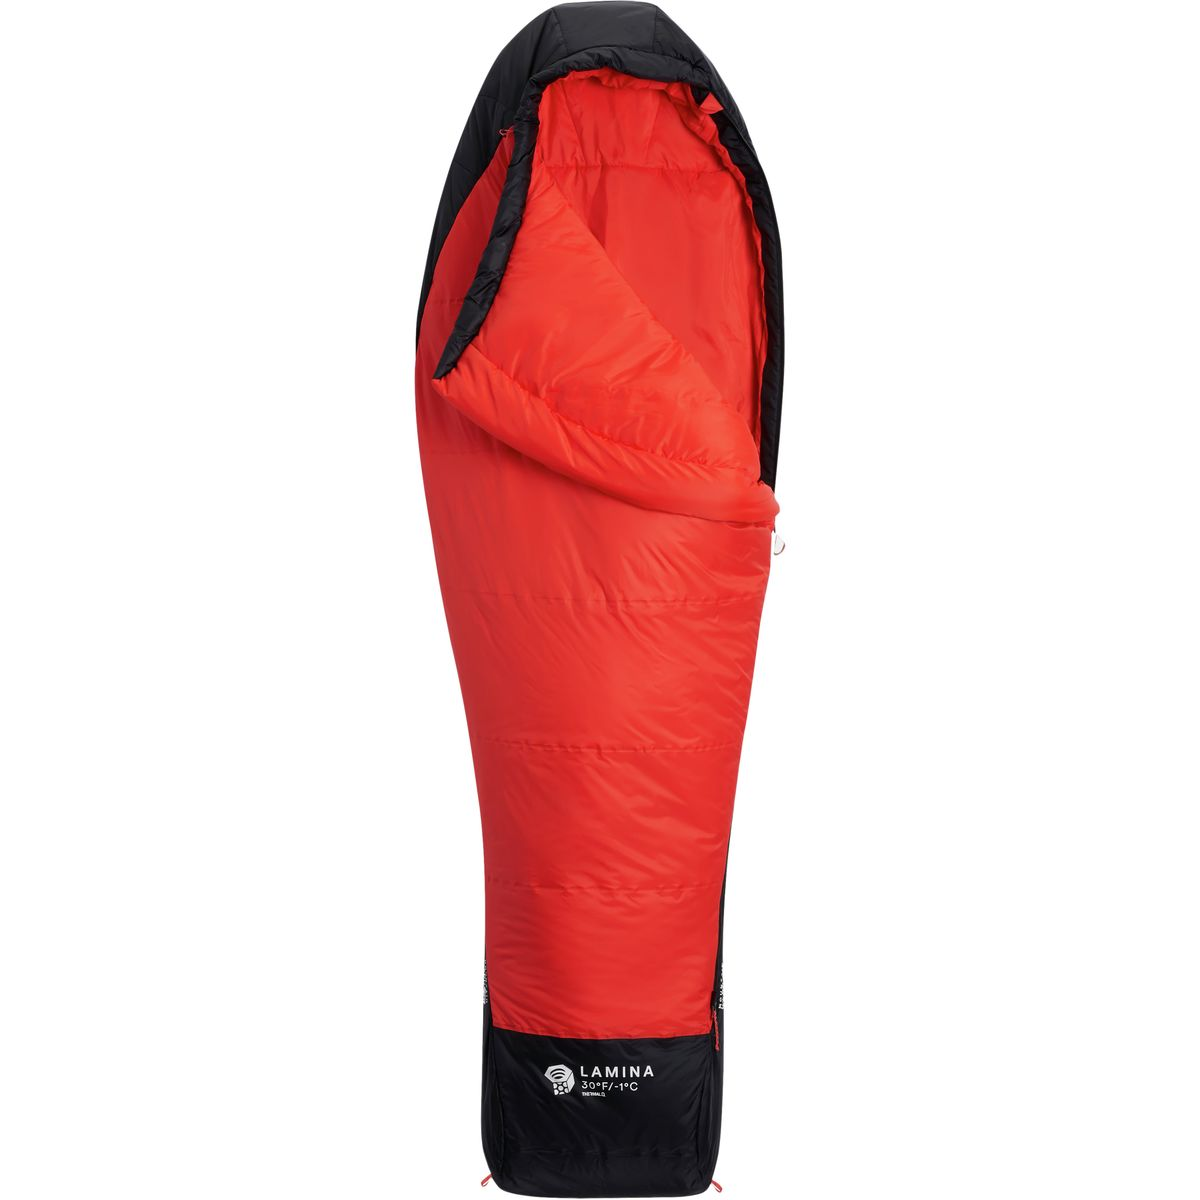 photo: Mountain Hardwear Women's Lamina 30F/-1C 3-season synthetic sleeping bag